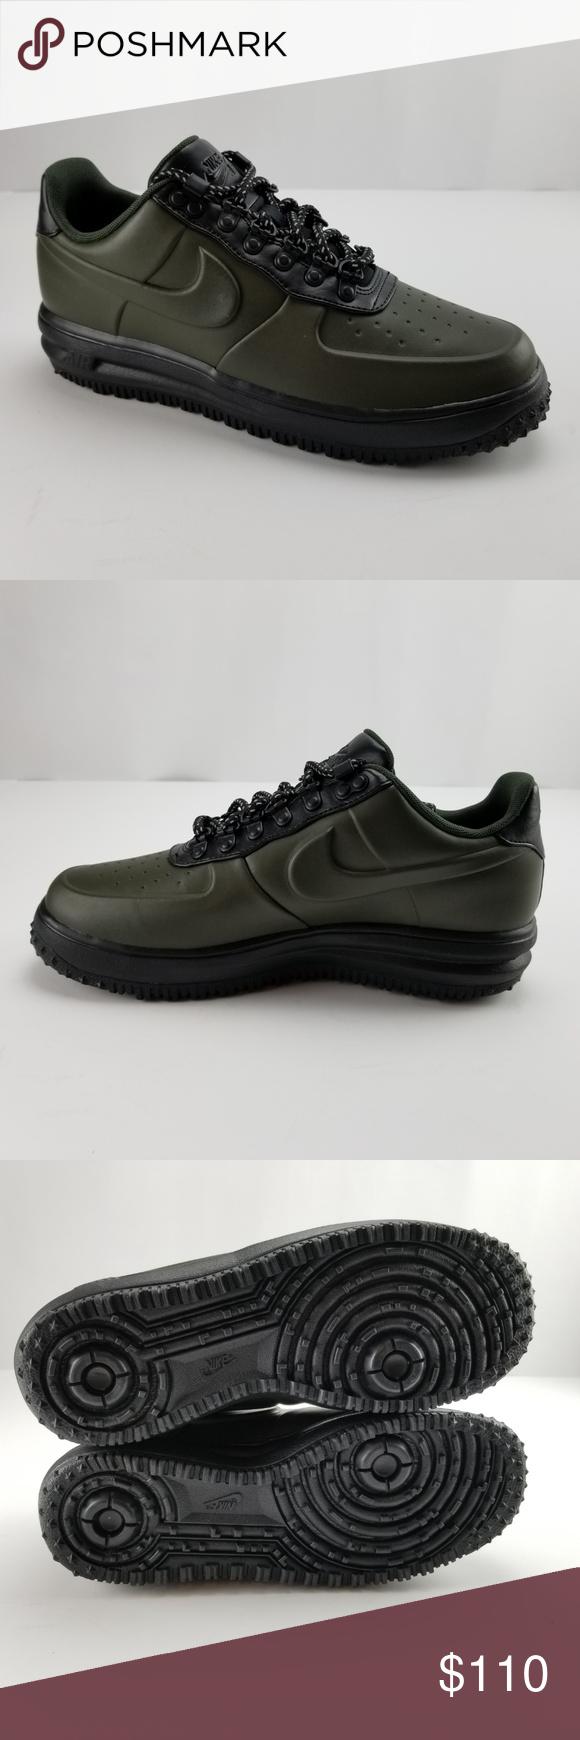 Nike LF1 Duckboot Low Casual Shoes Sequoia Green Black AA1125-300 Men/'s NEW